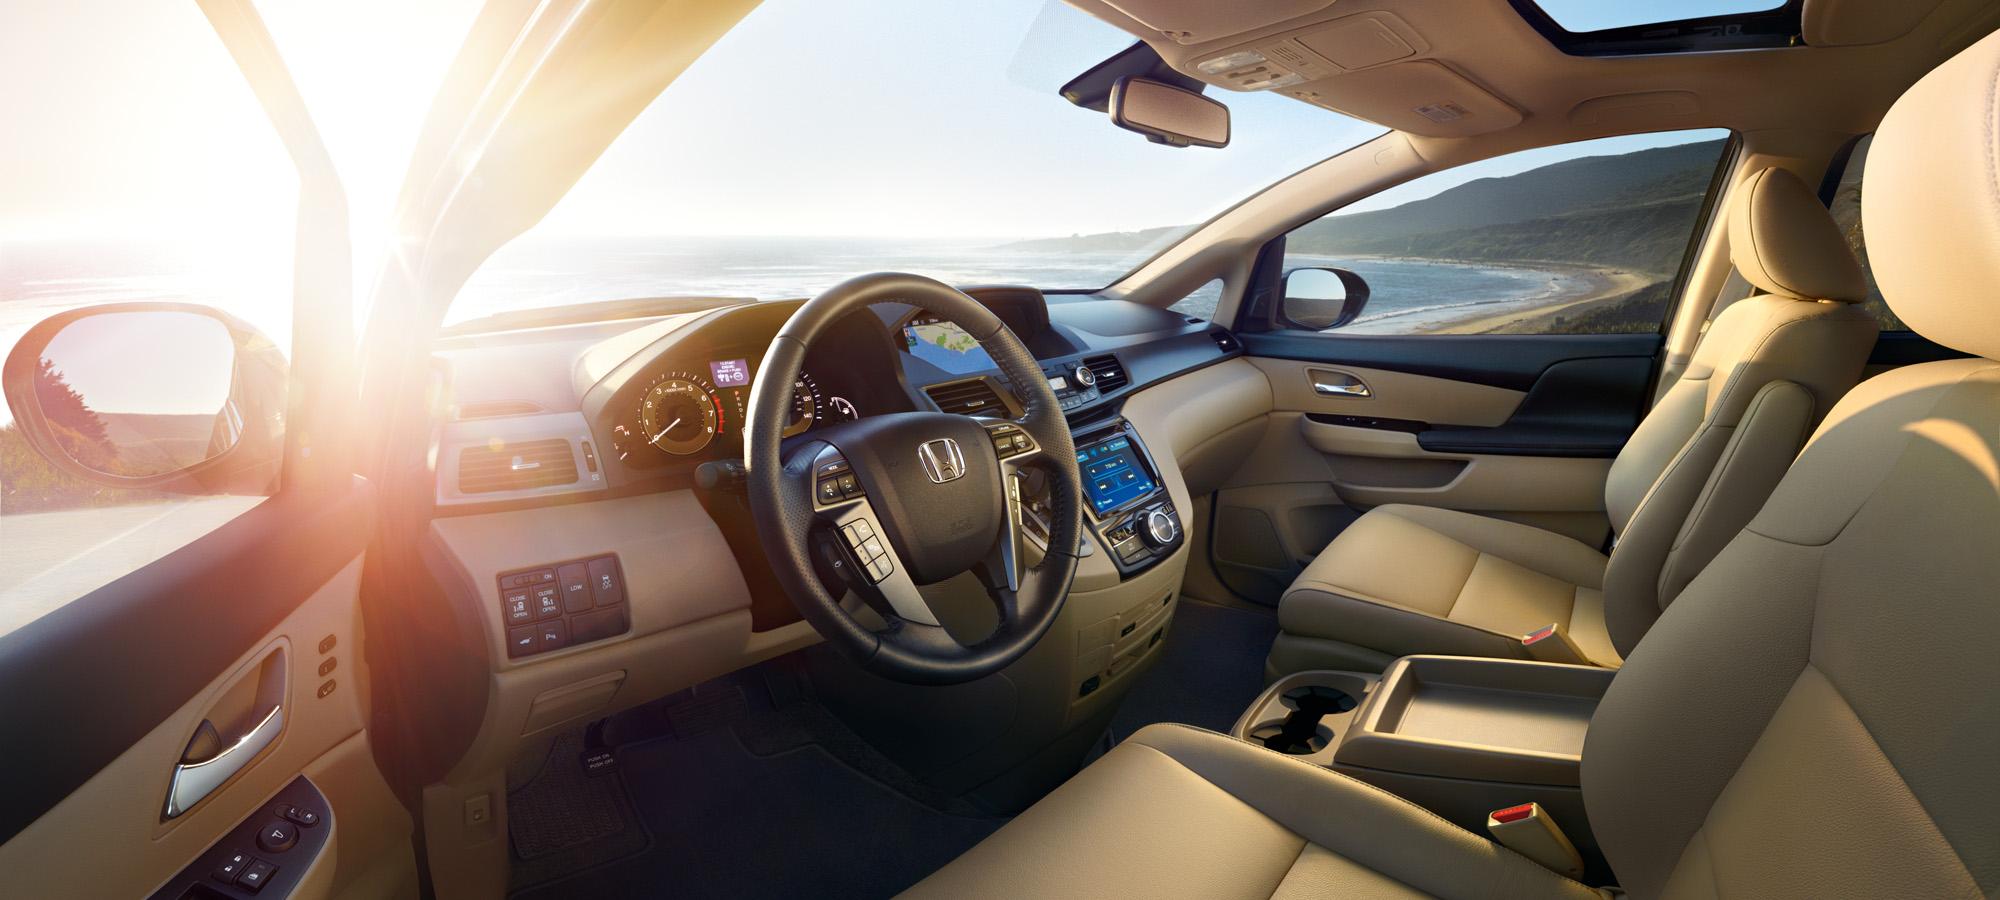 2016 Honda Odyssey For Sale in Waukesha, WI